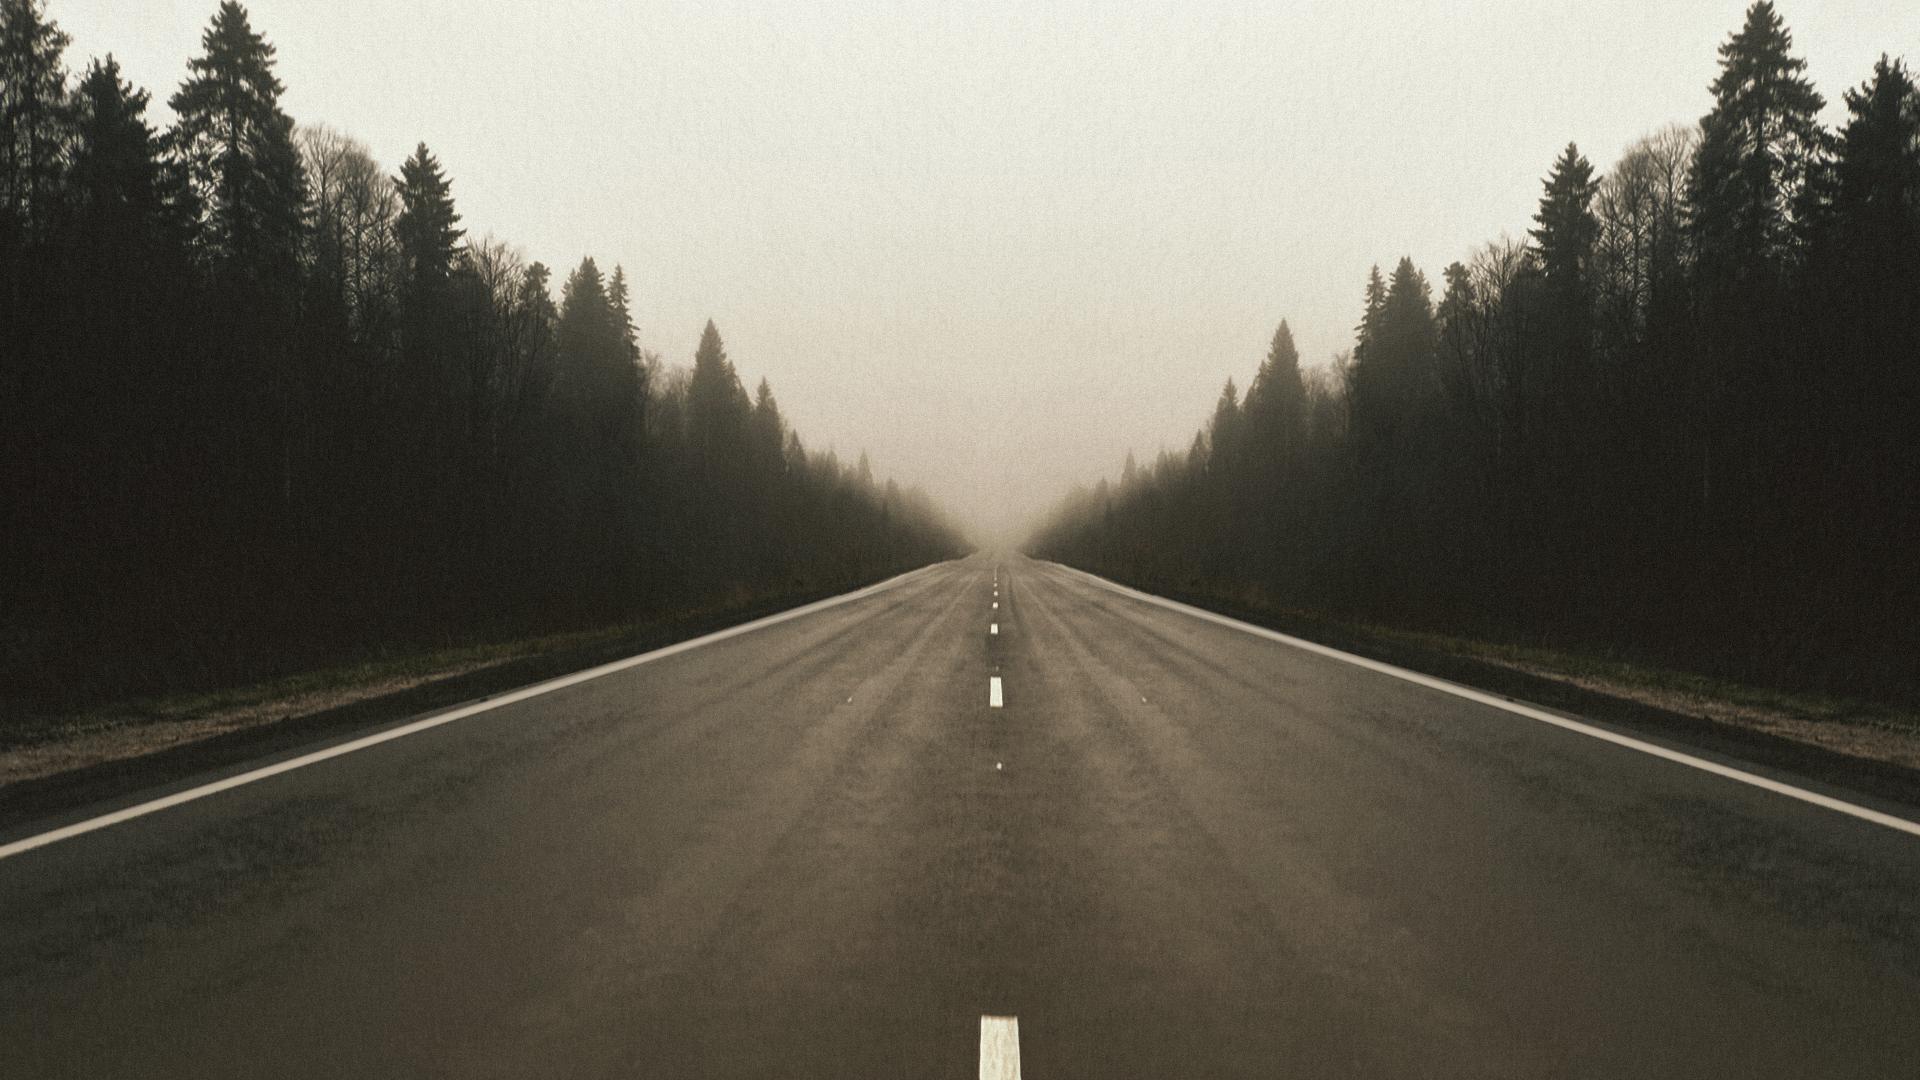 Wallpaper : road, forest, fall, mist, asphalt, trees, landscape